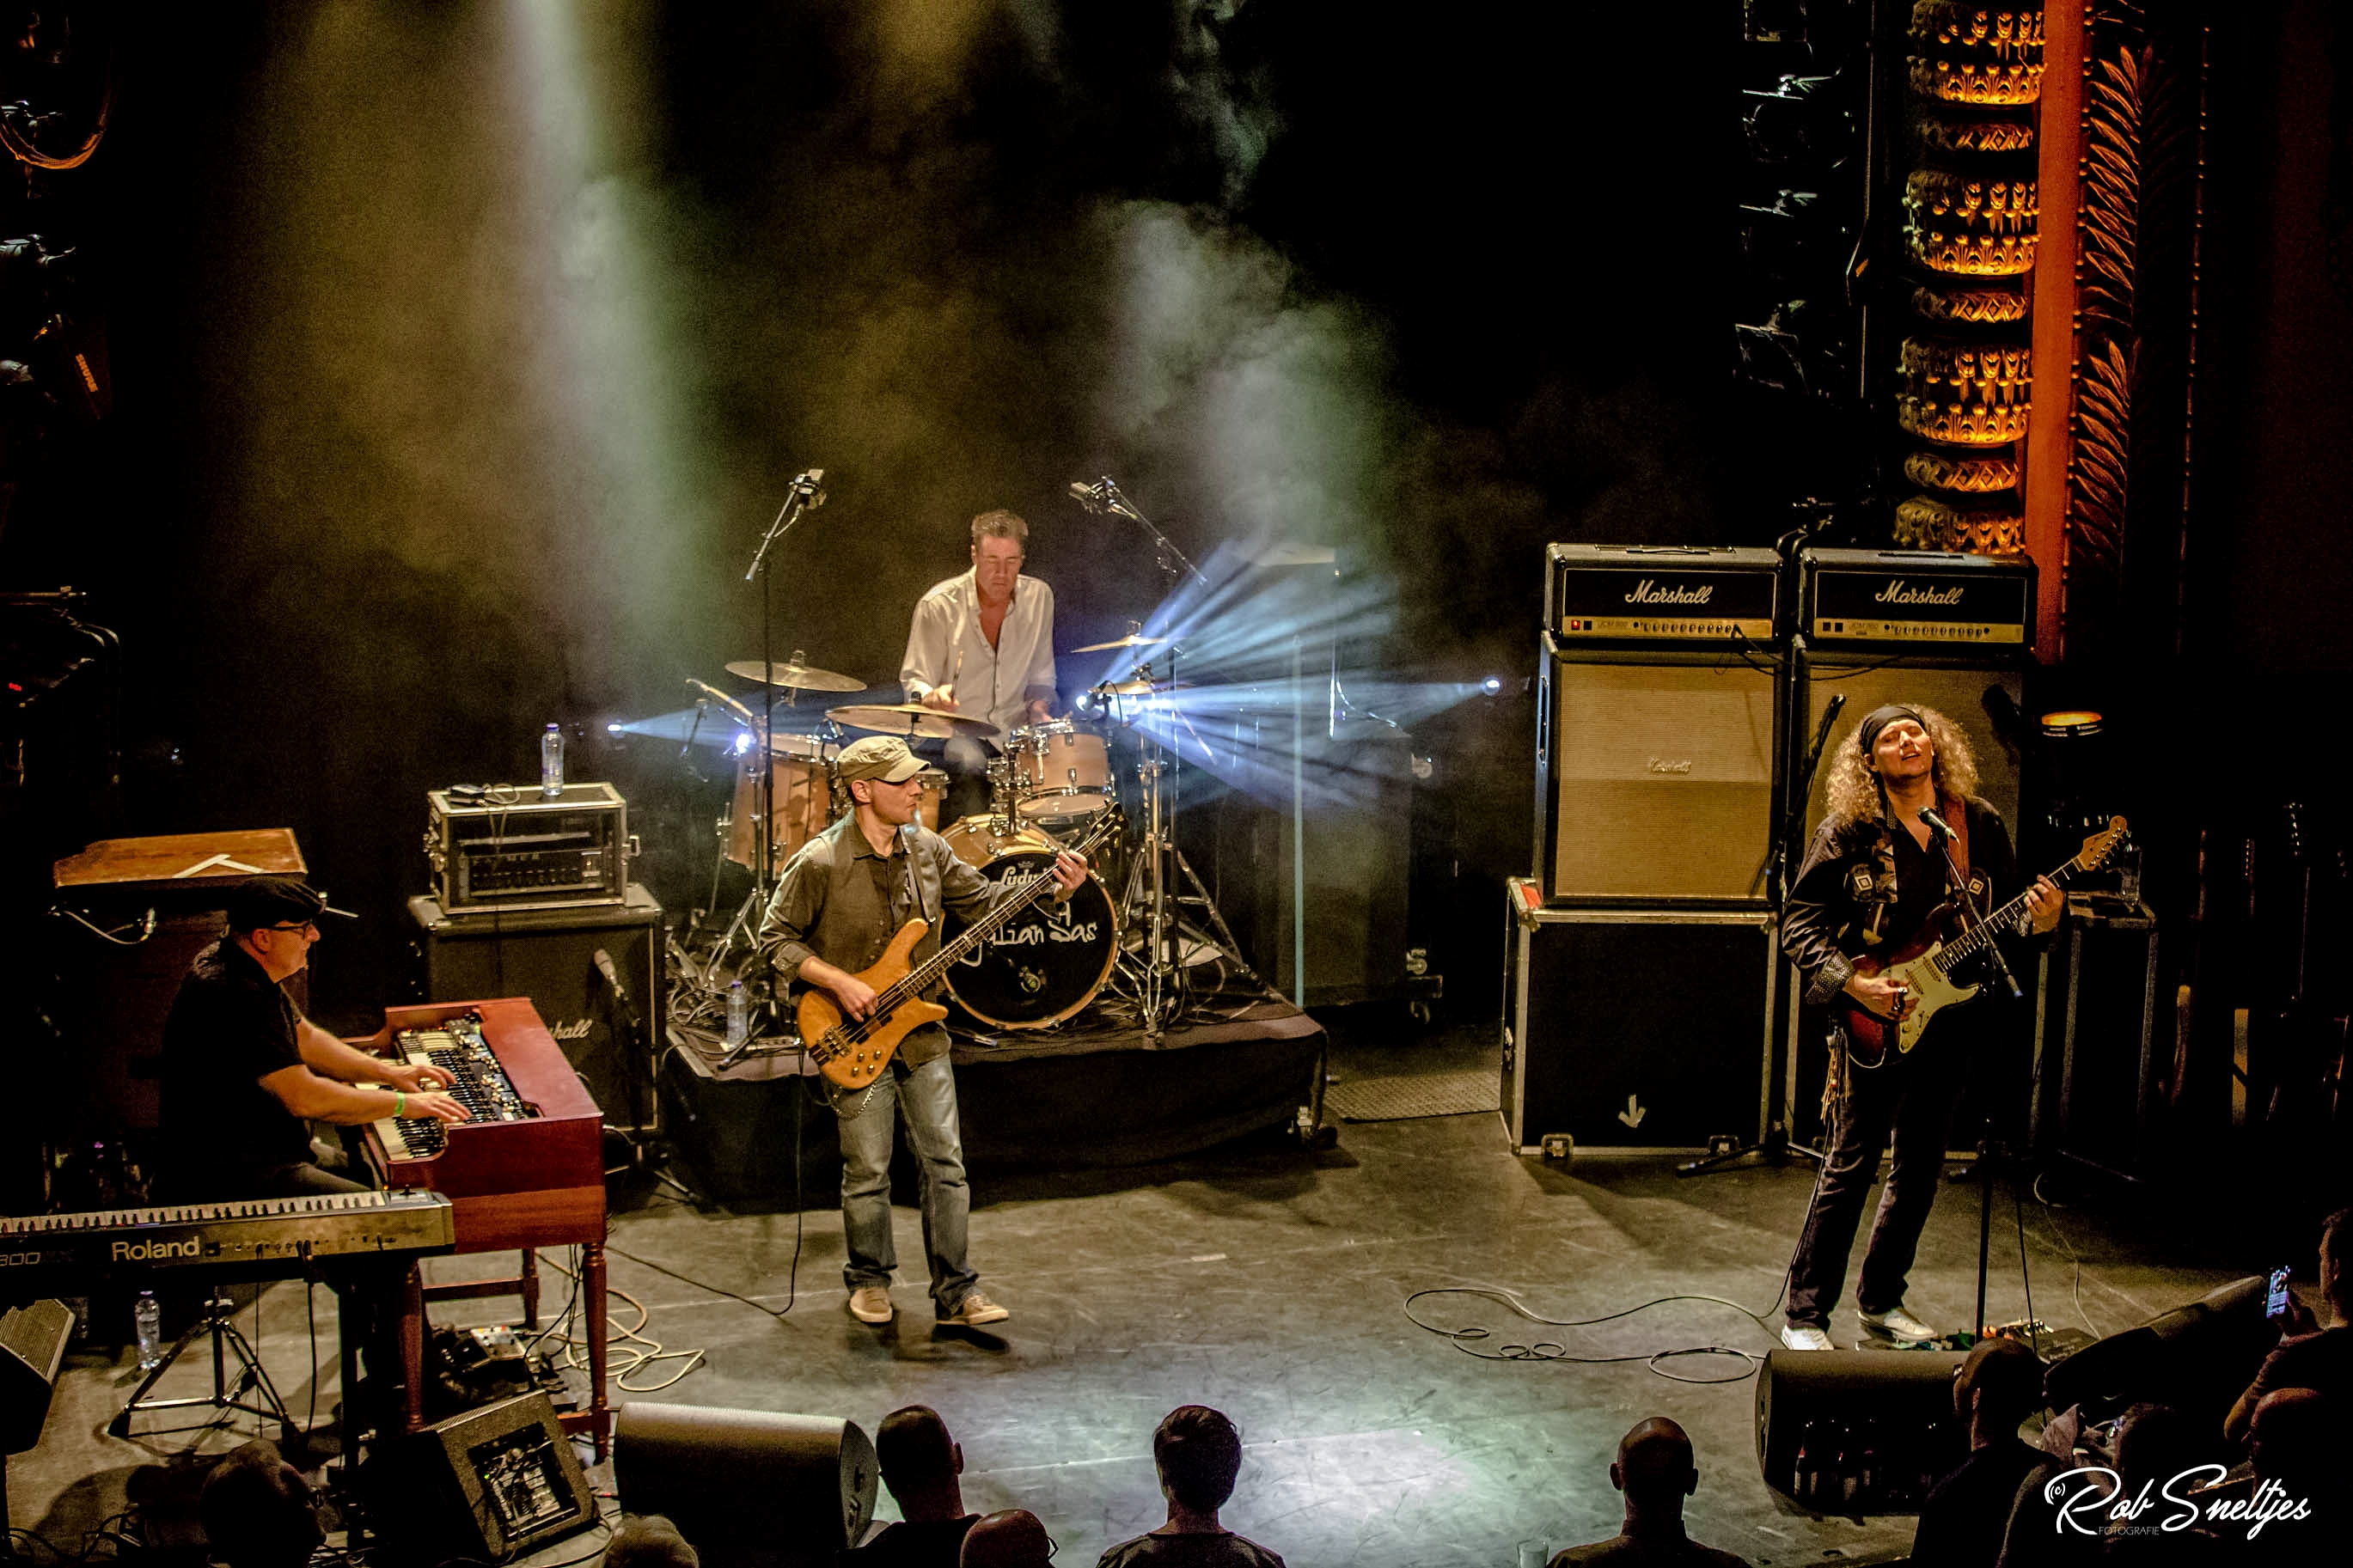 Julian-Sas-Band-Luxor-Live-Arnhem-2018-©RobSneltjes6K4A5273-copy-6